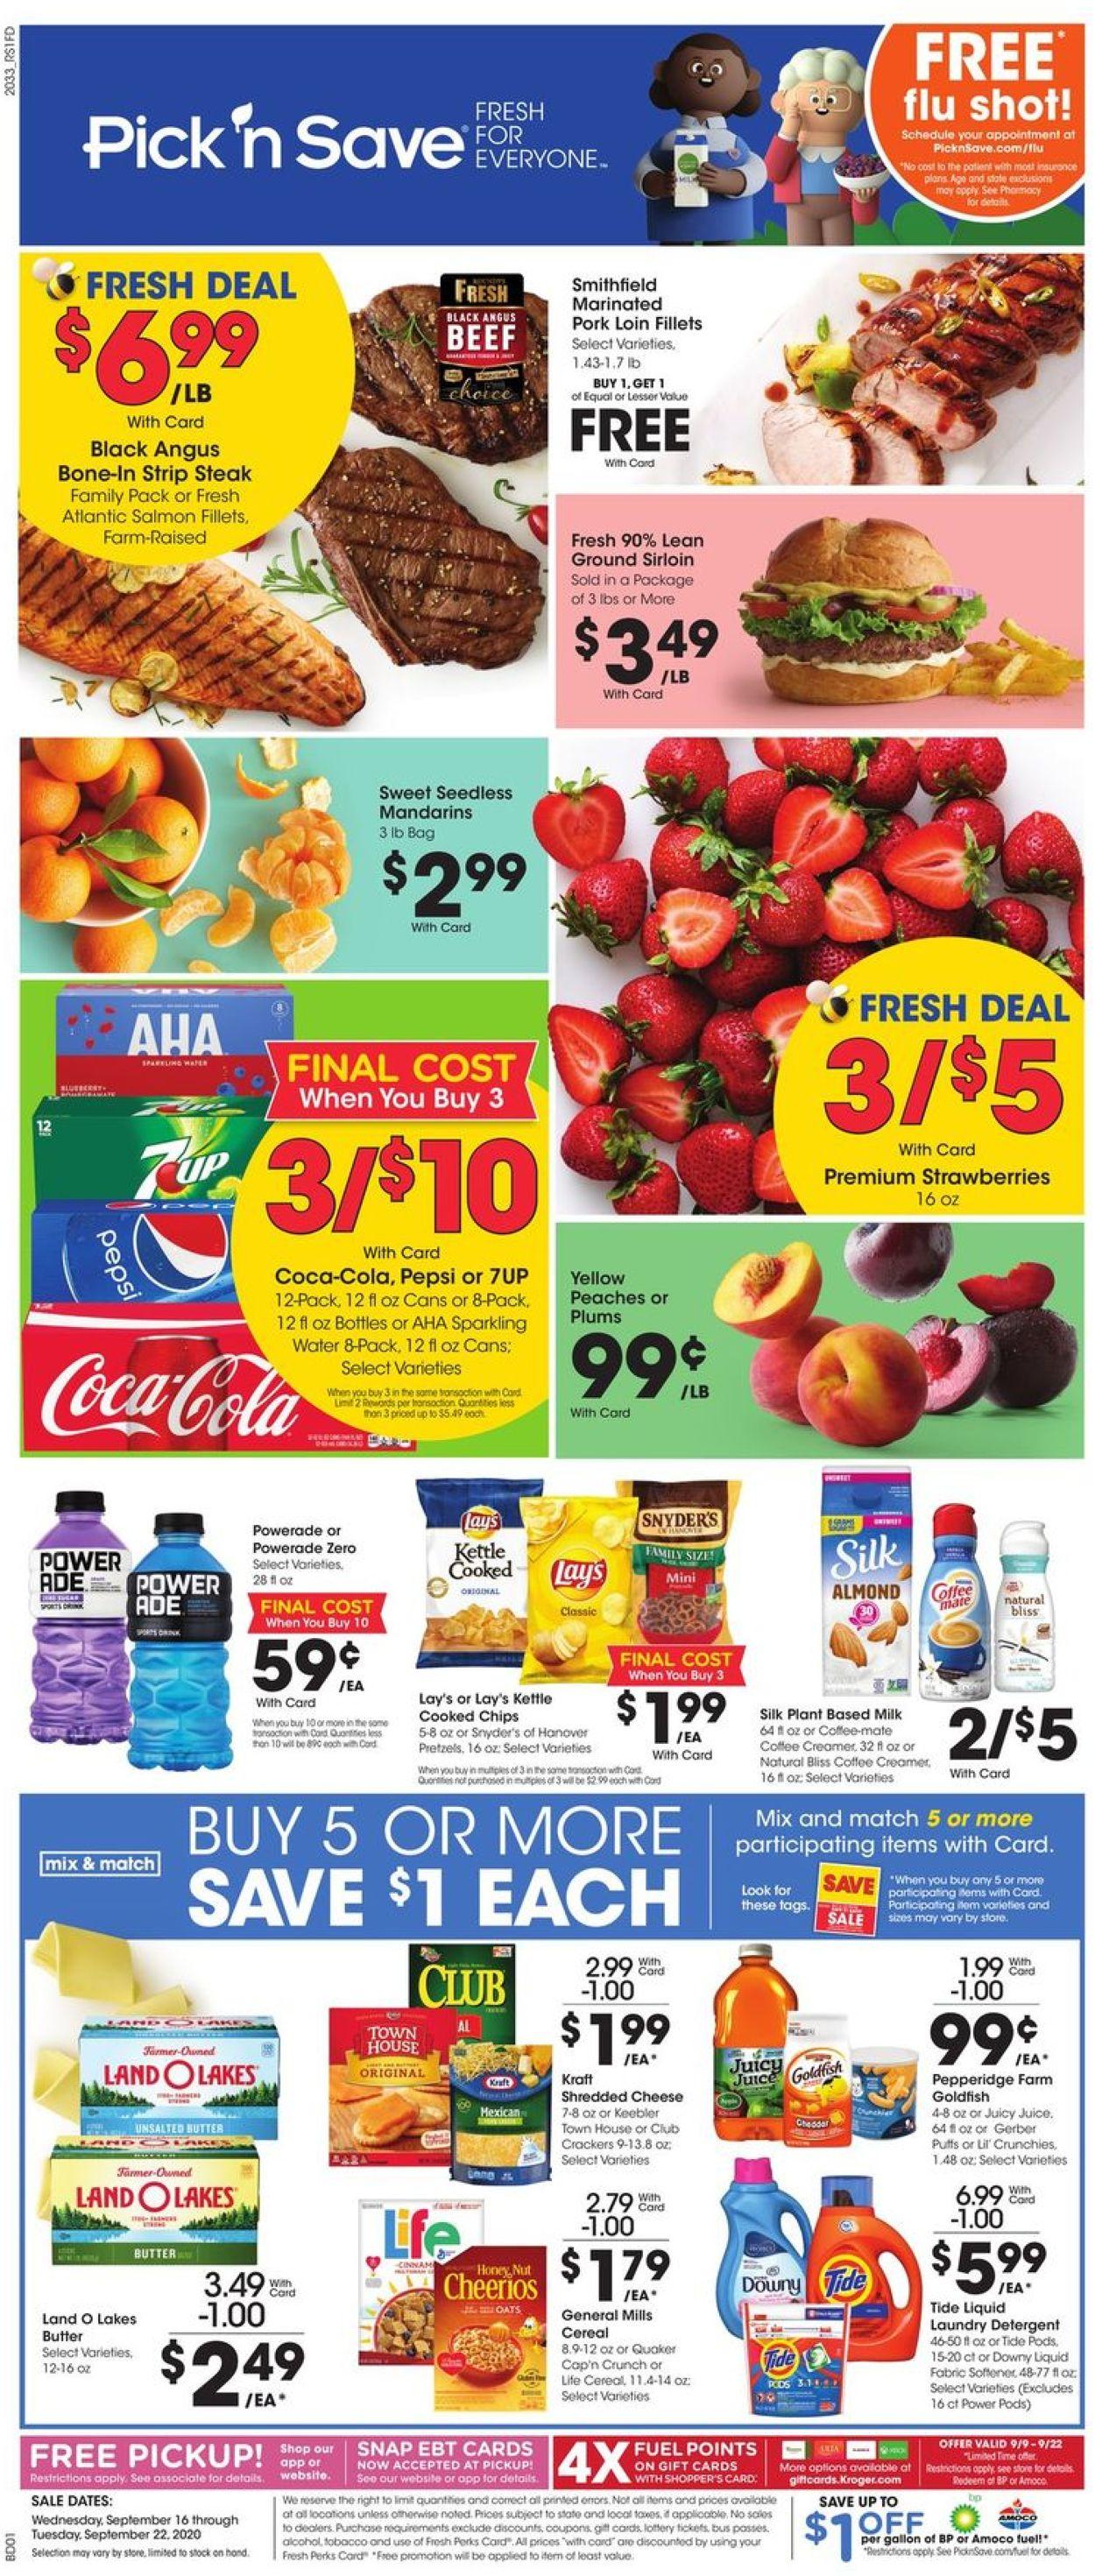 Pick 'n Save Weekly Ad Circular - valid 09/16-09/22/2020